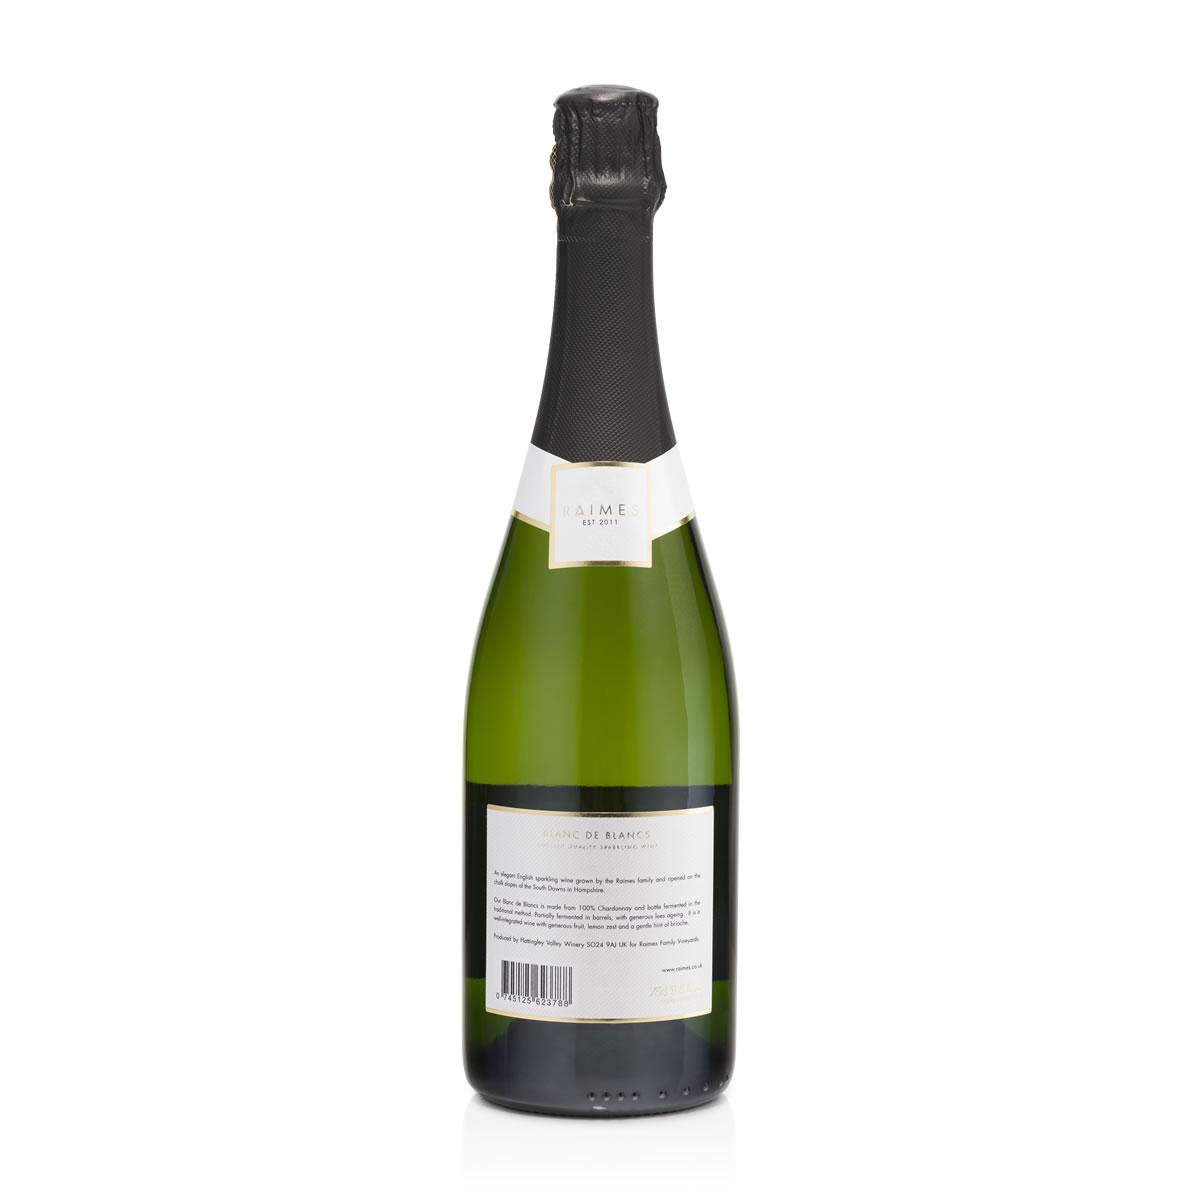 2016 BLANC DE BLANCS - Raimes English Sparkling Wine